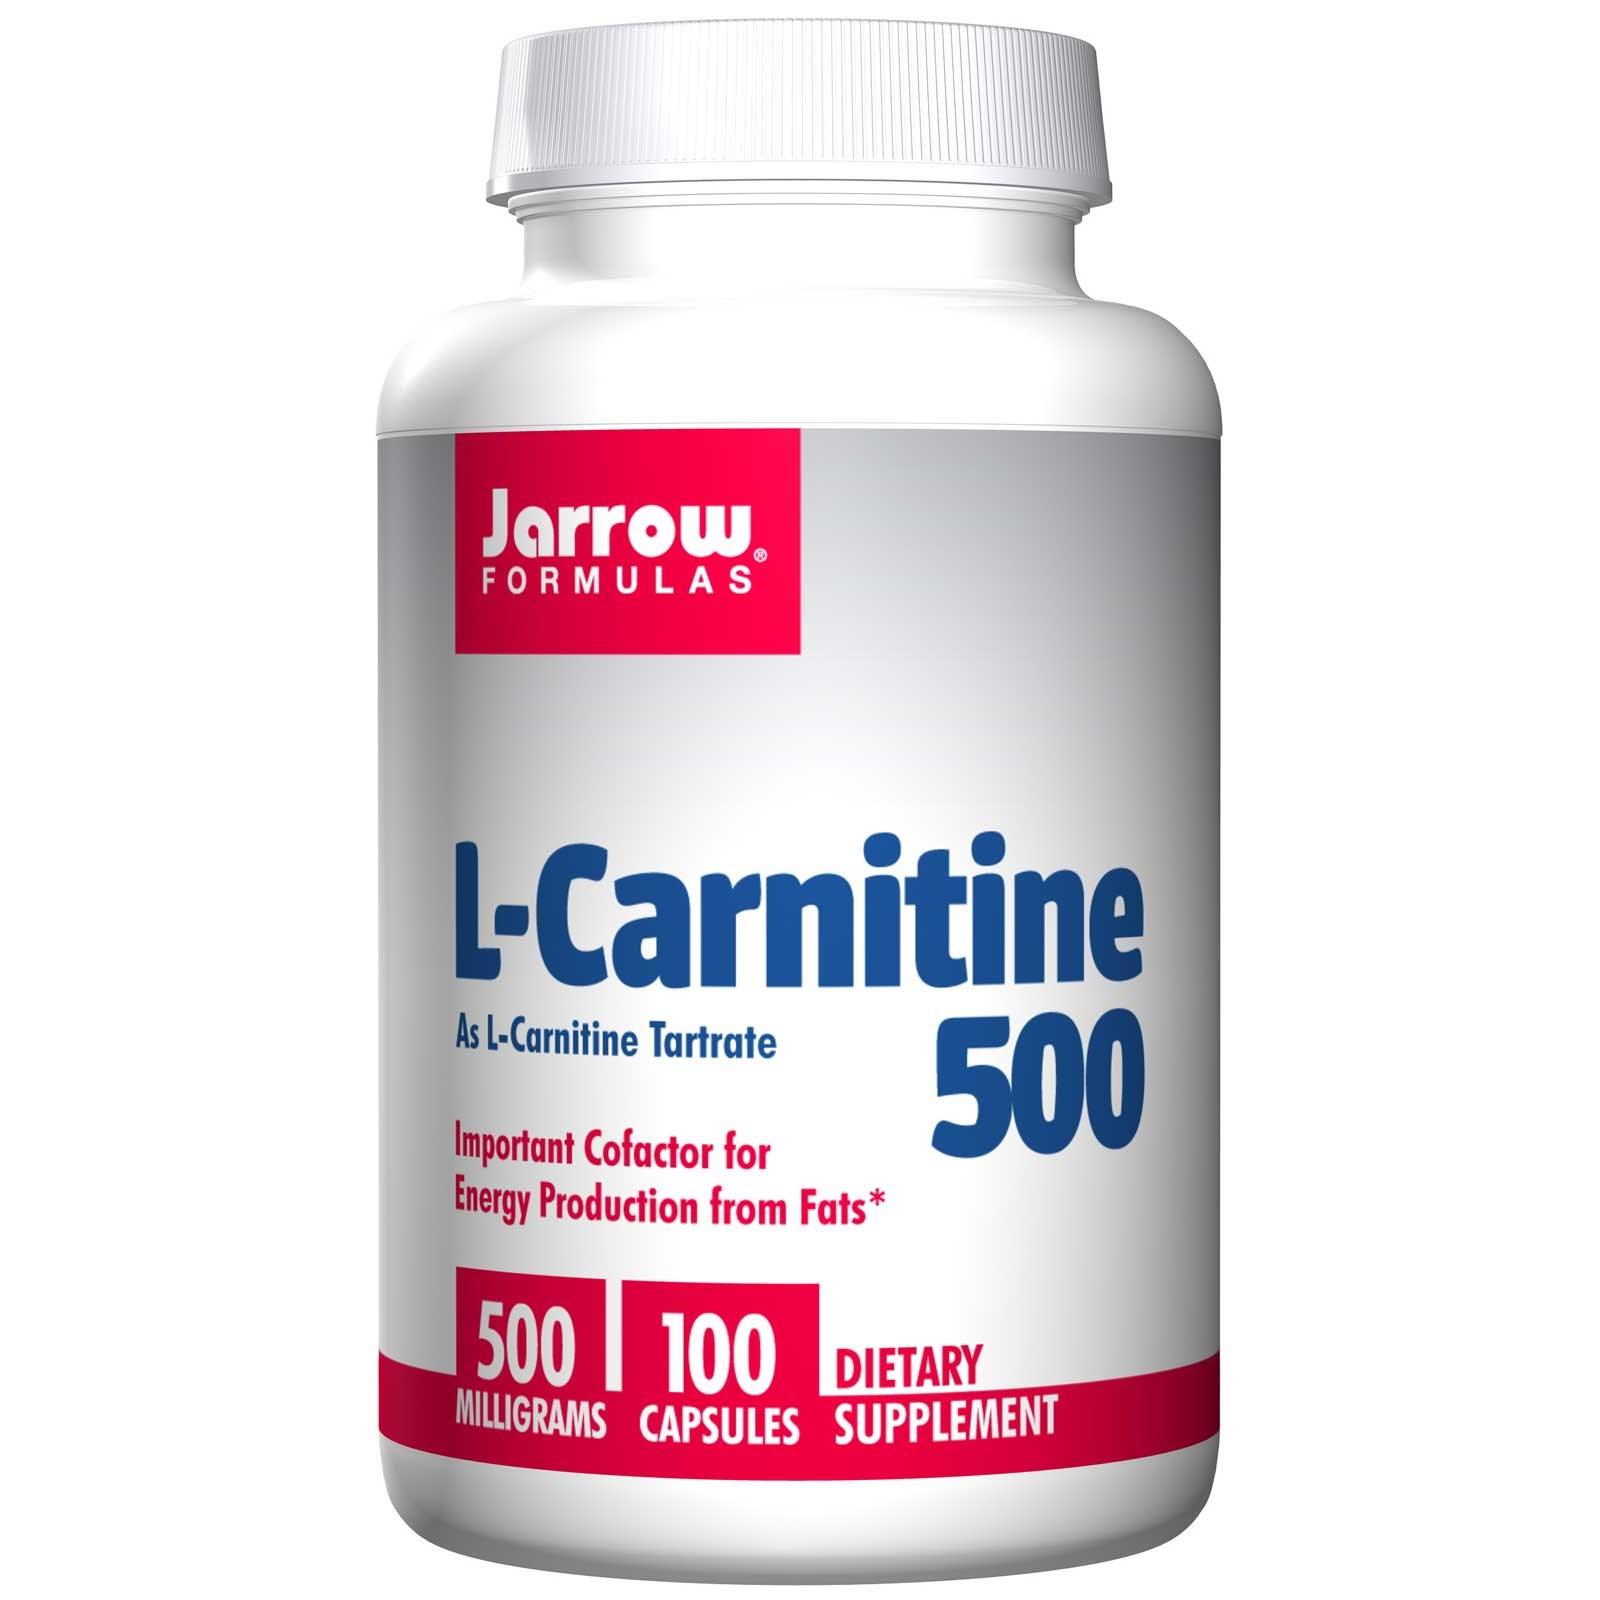 Image of L-carnitina 500, 500 mg (100 capsule) - Jarrow Formulas 0790011020028